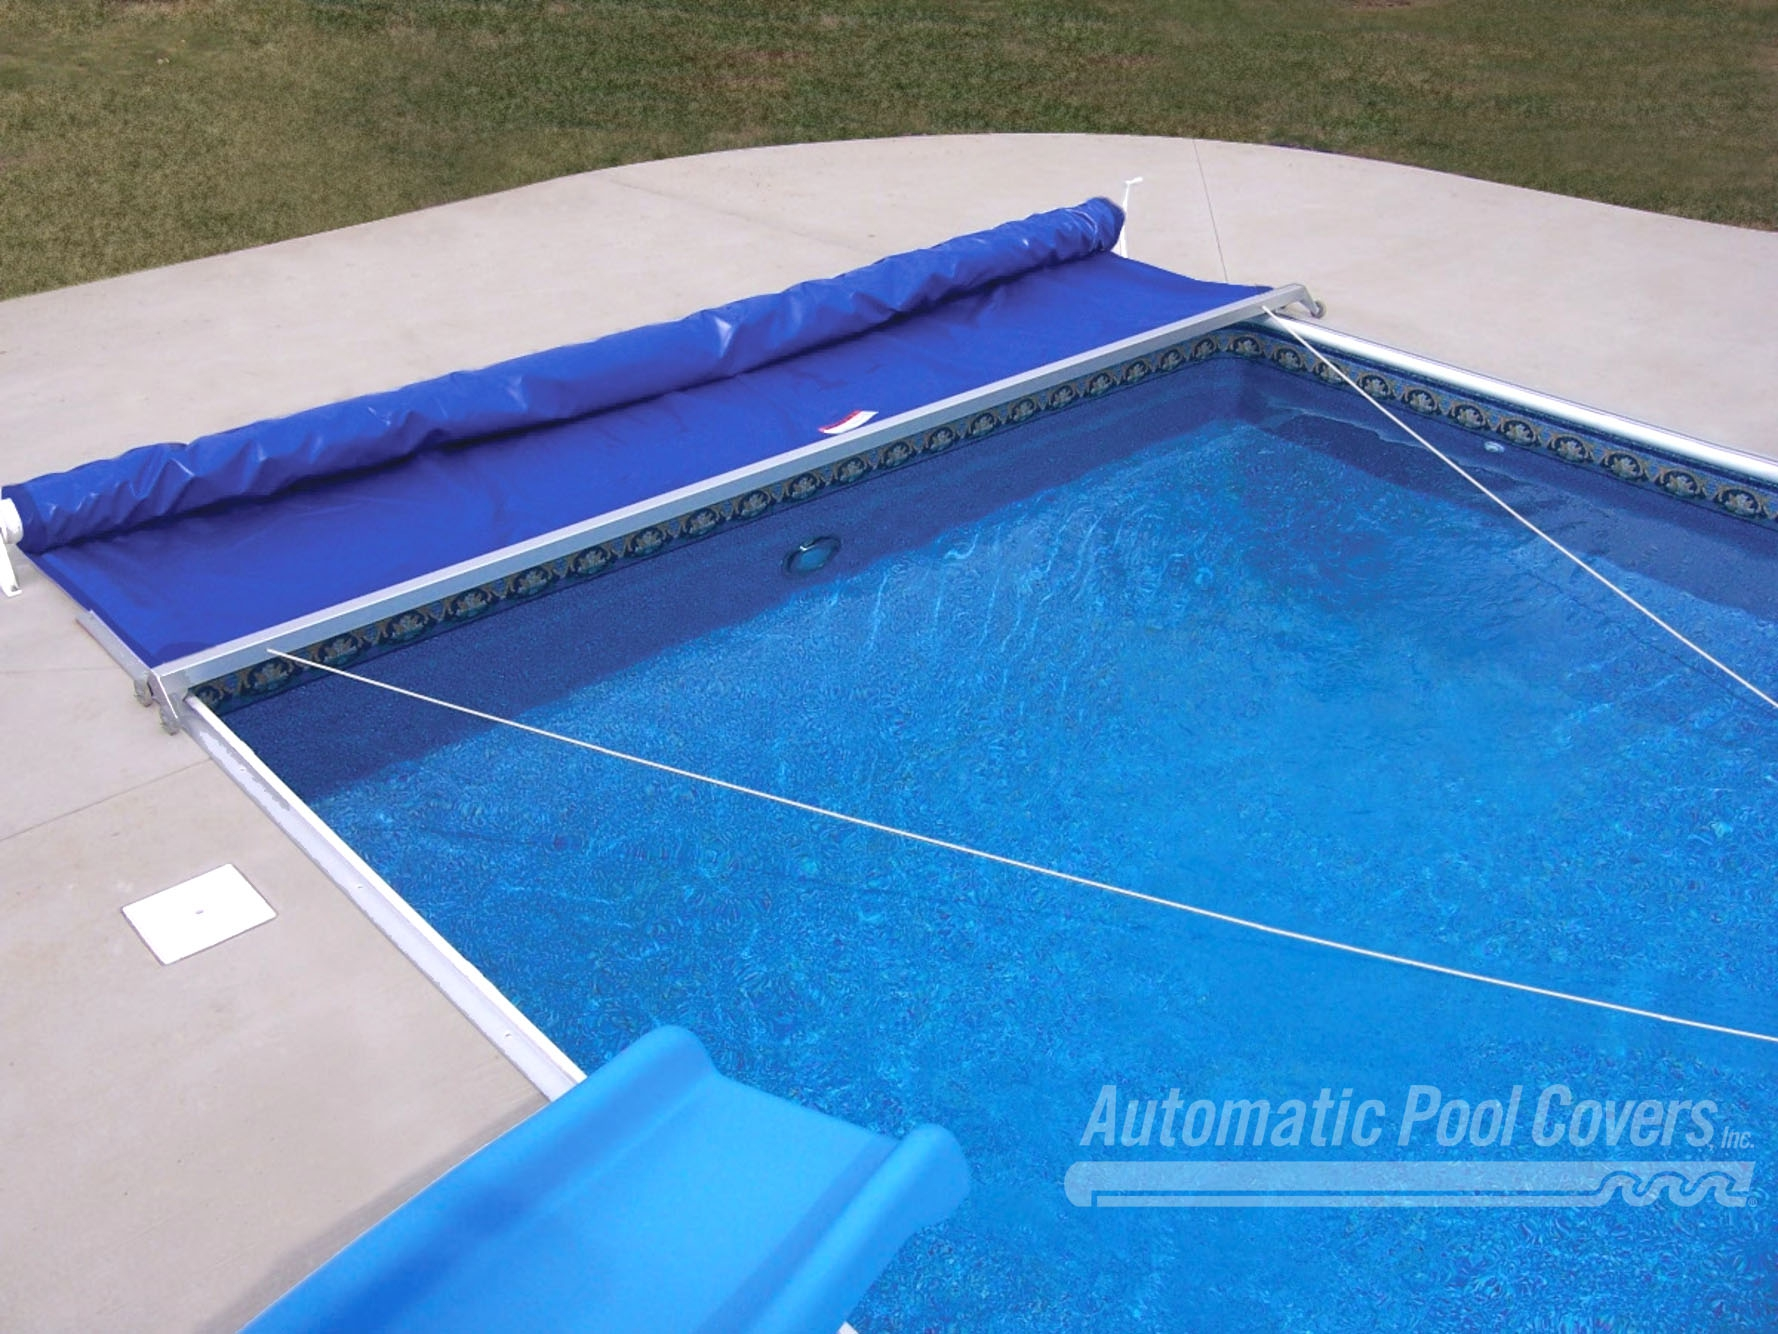 Manualguard Pool Cover Automatic Pool Covers